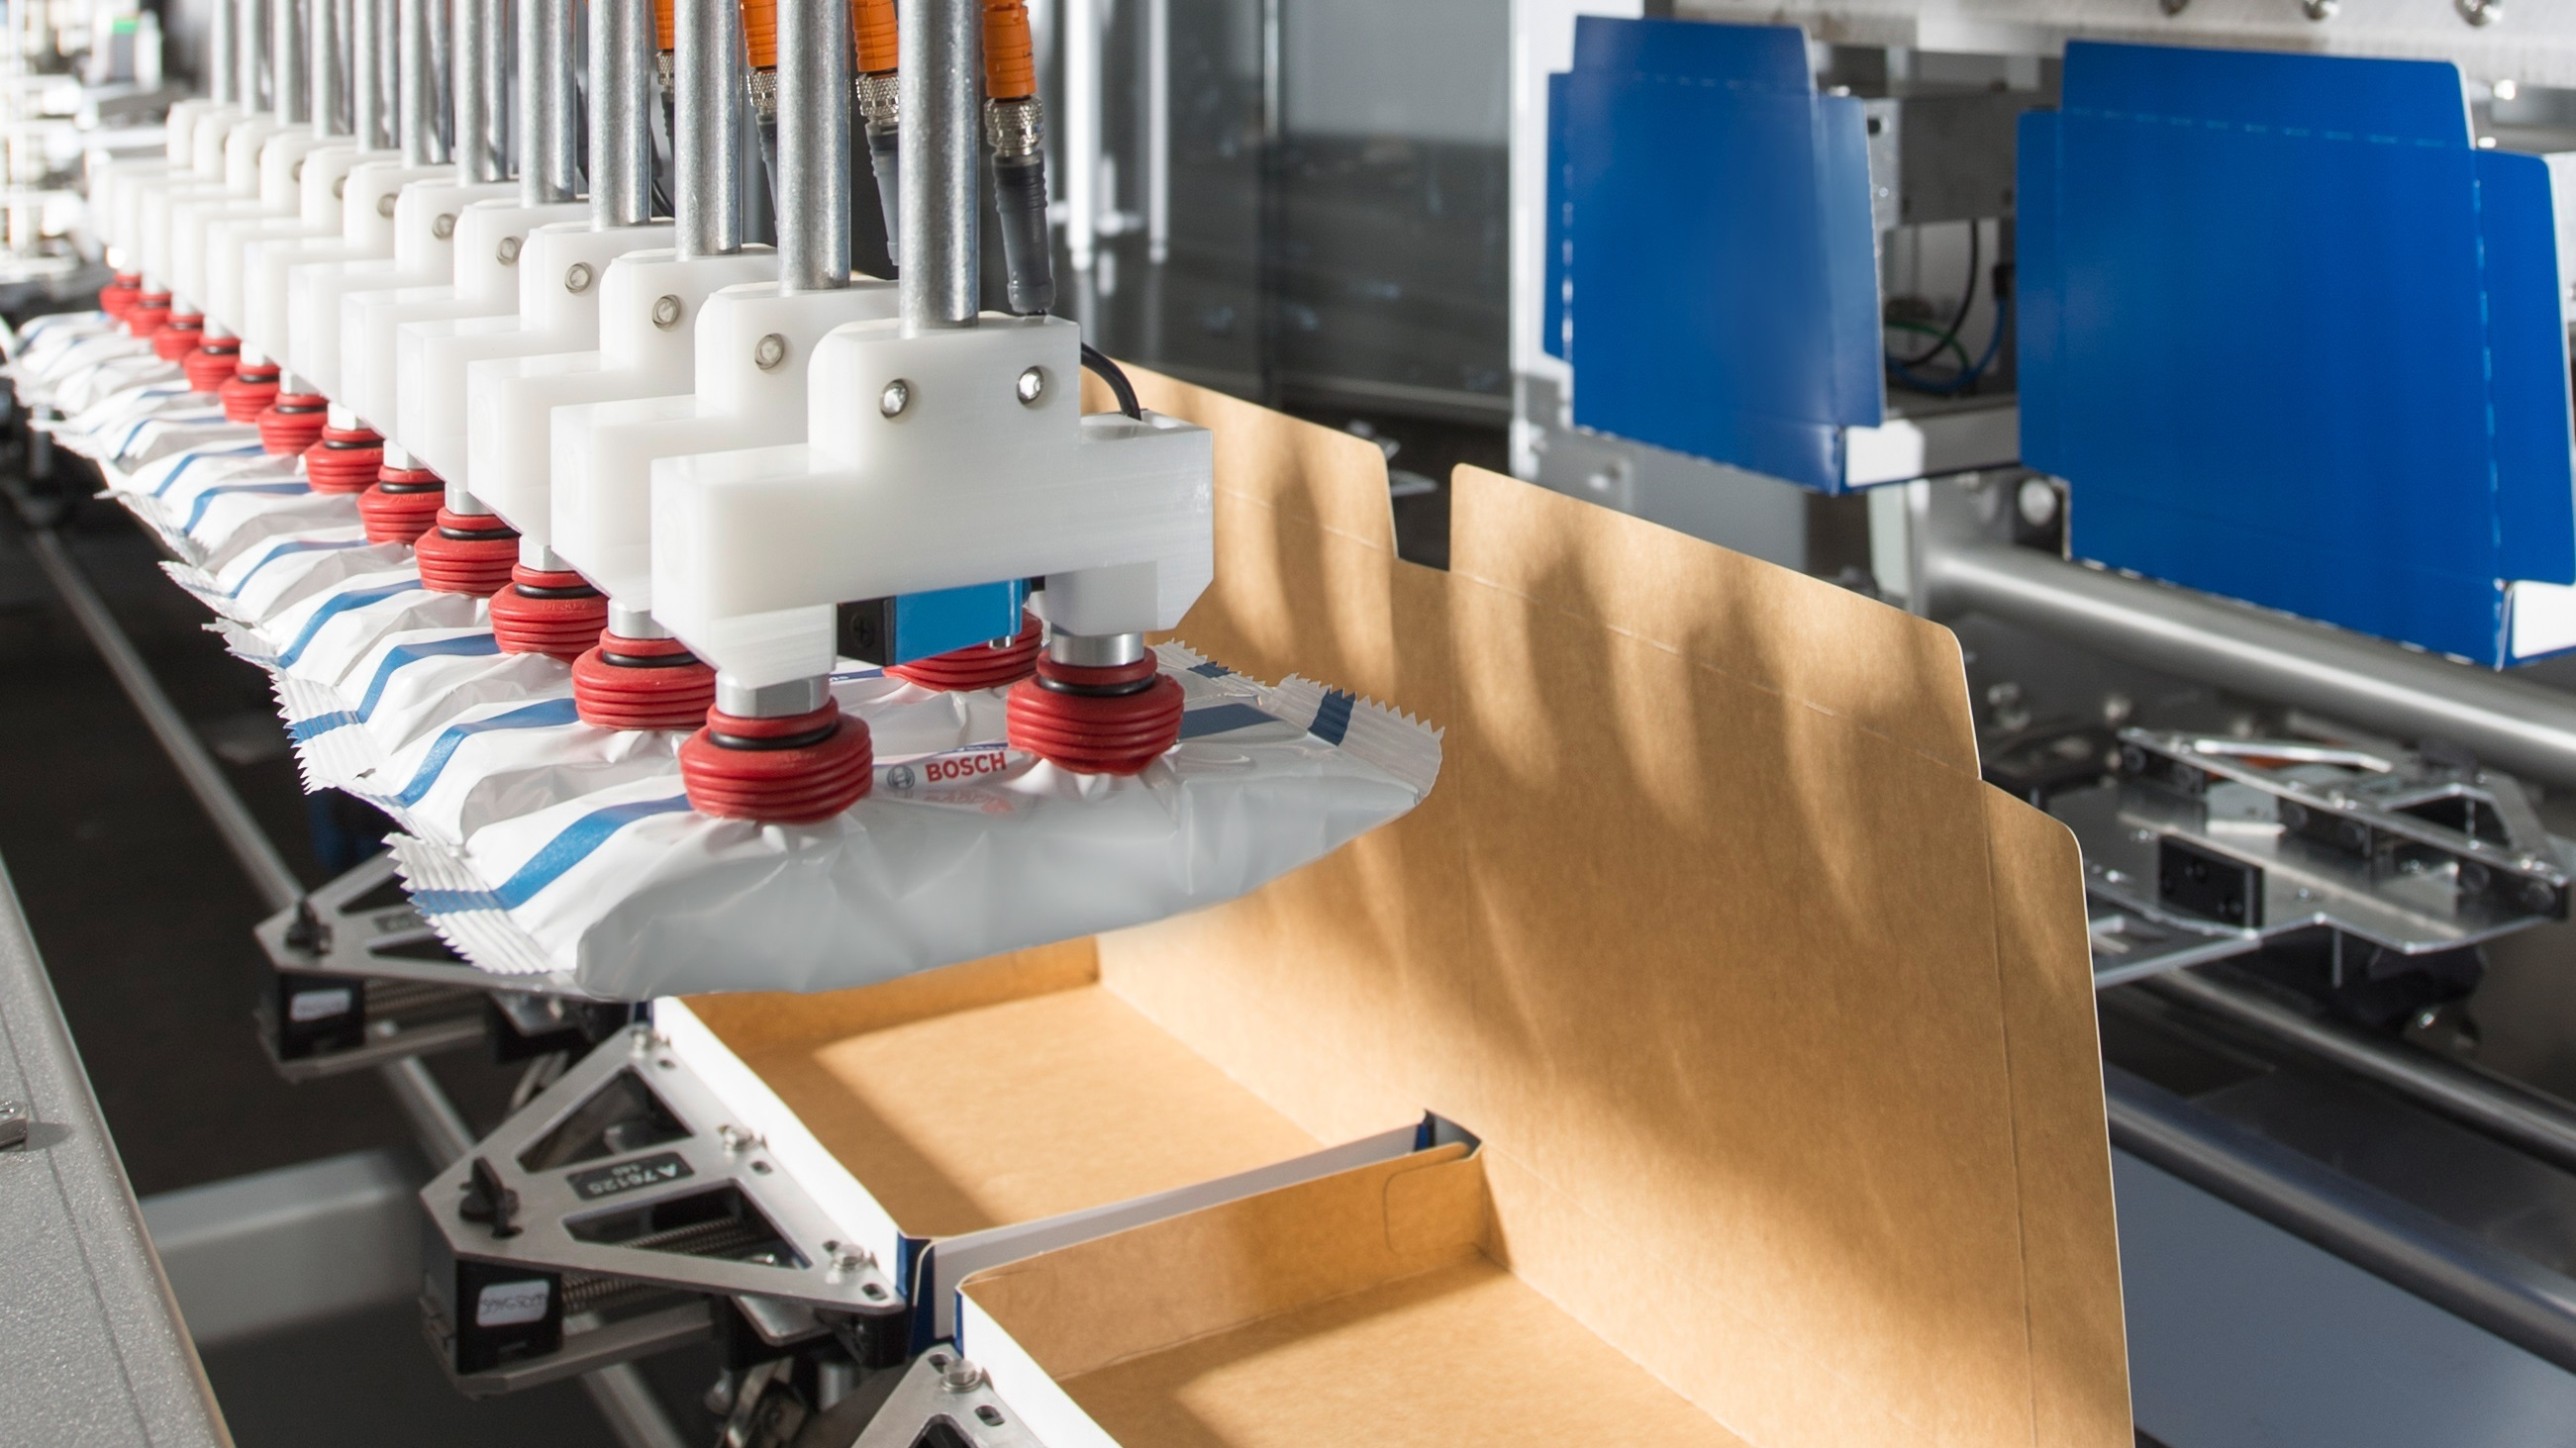 Bosch Grand Prix Kühlschrank : Bosch plant verkauf des geschäfts mit verpackungsmaschinen bosch